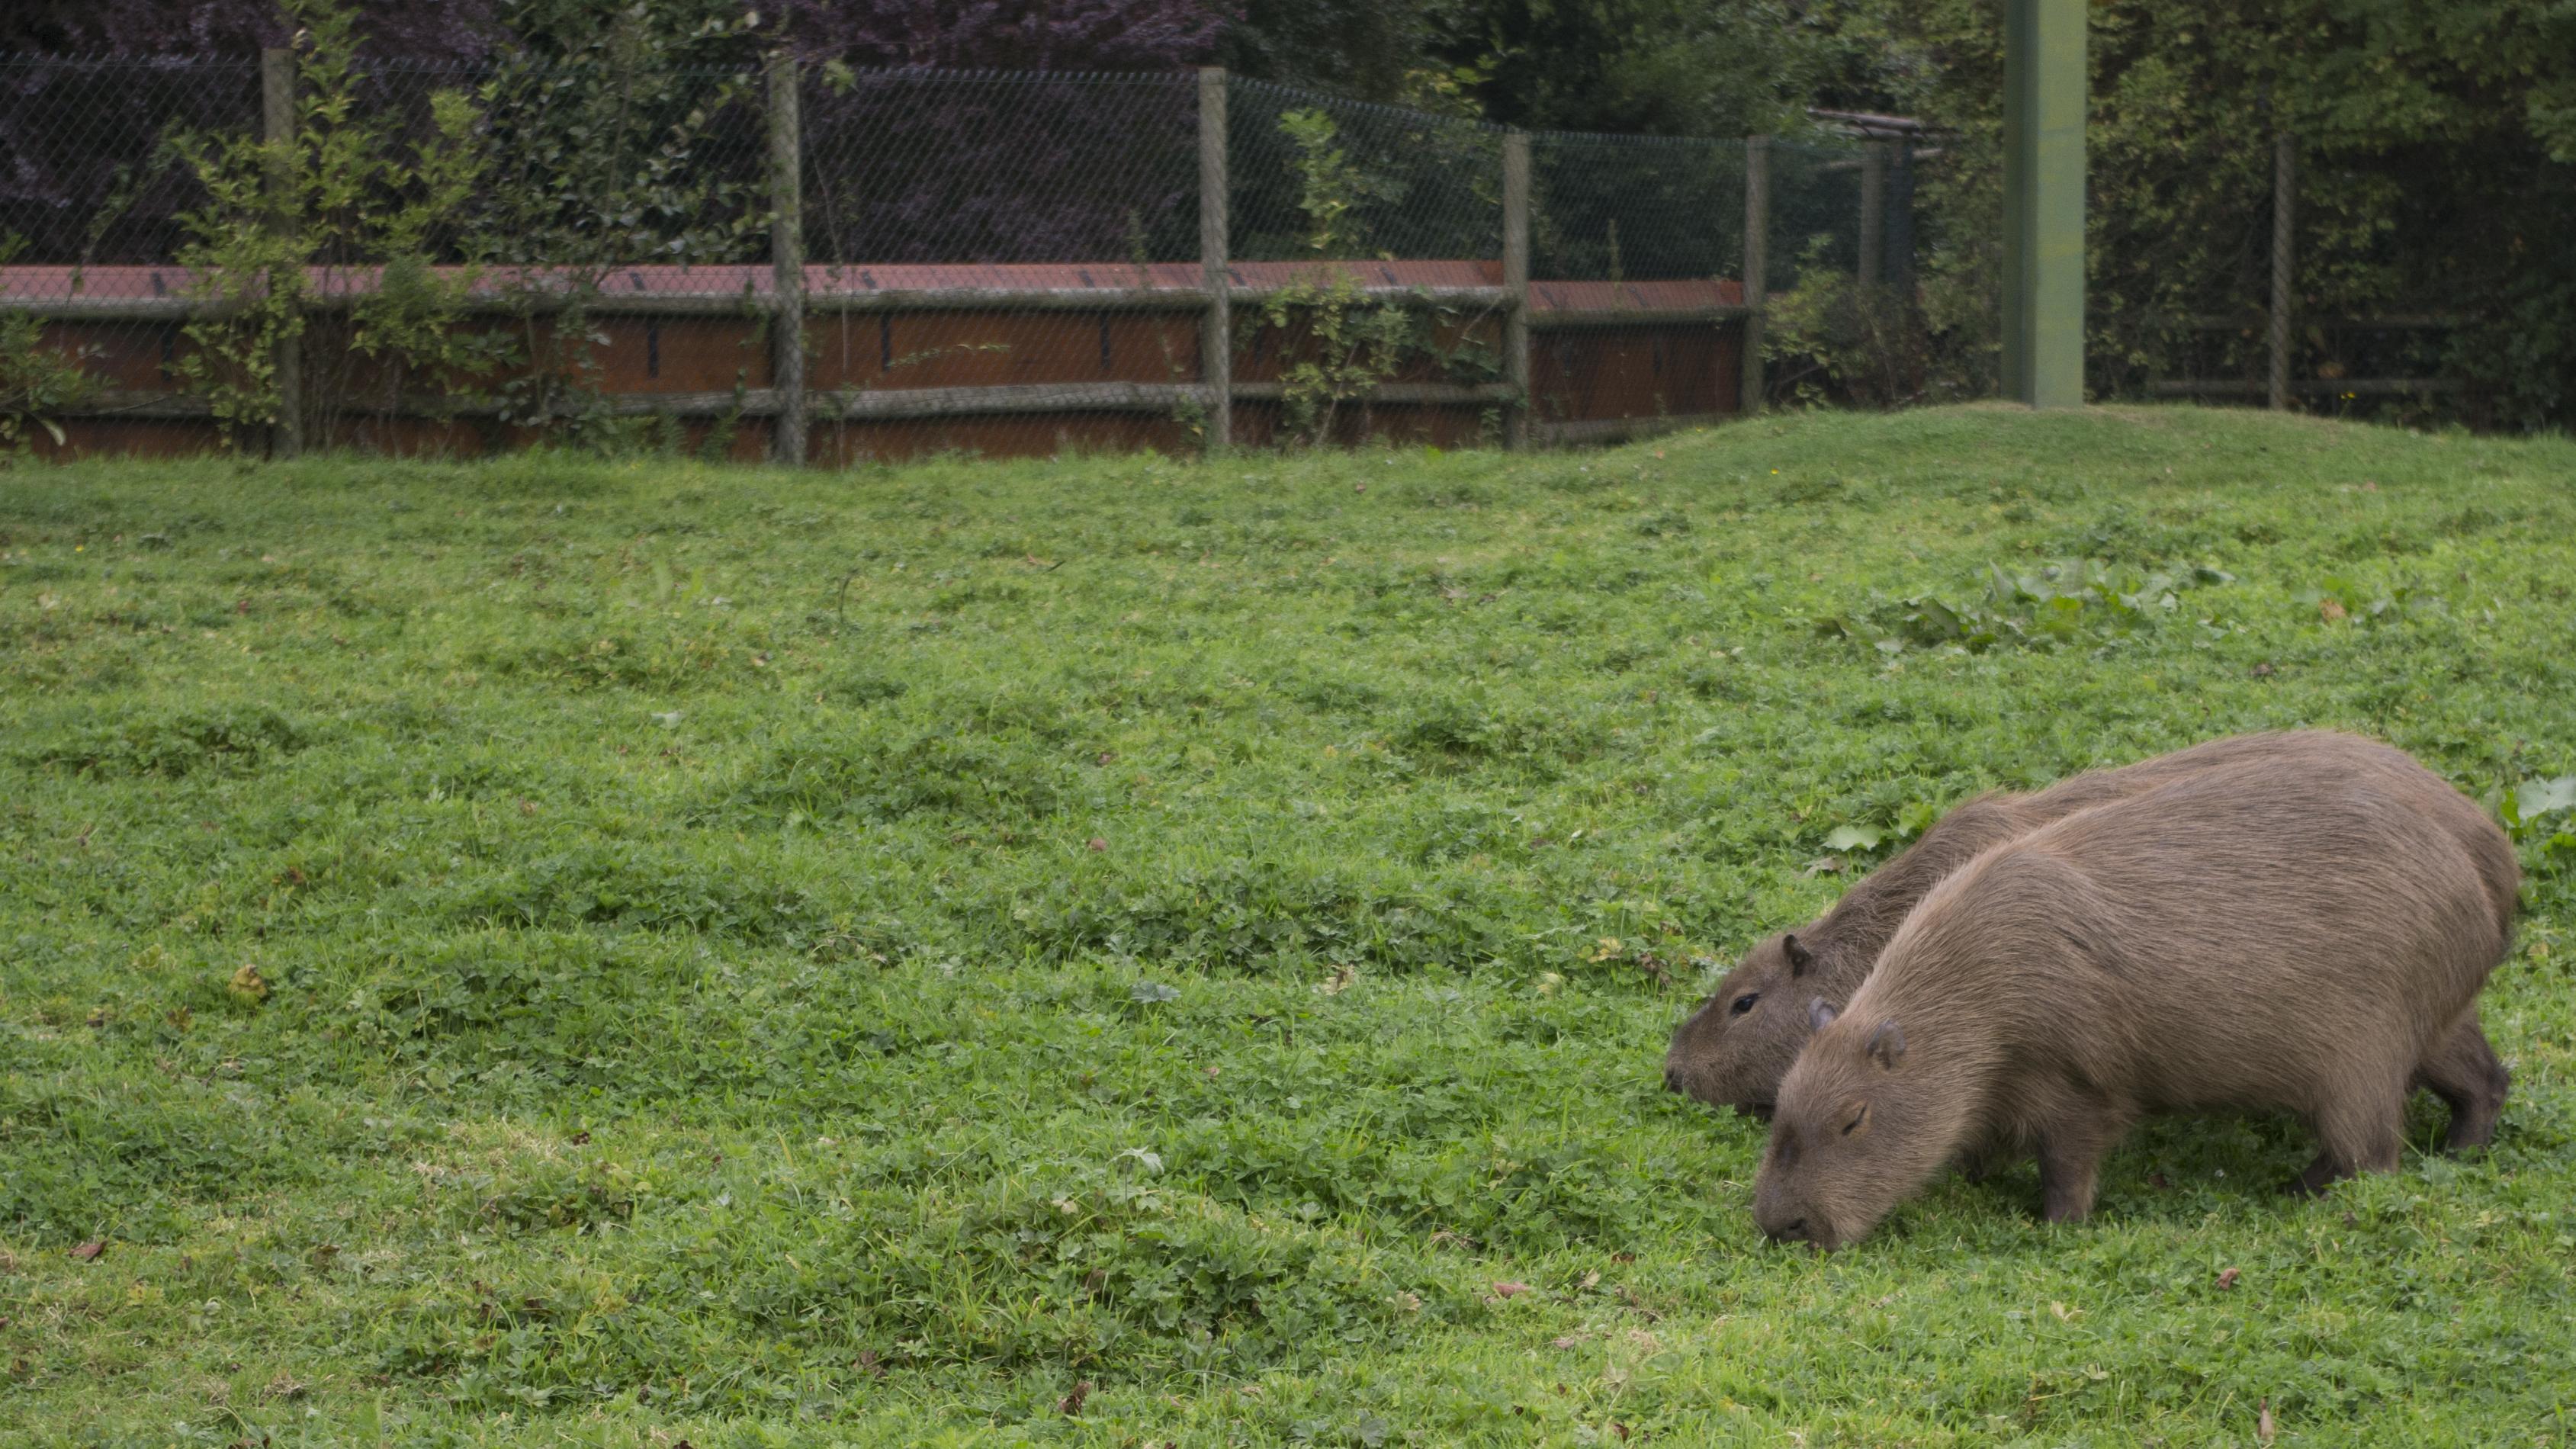 capybaras_doing_capybara_things____by_ze